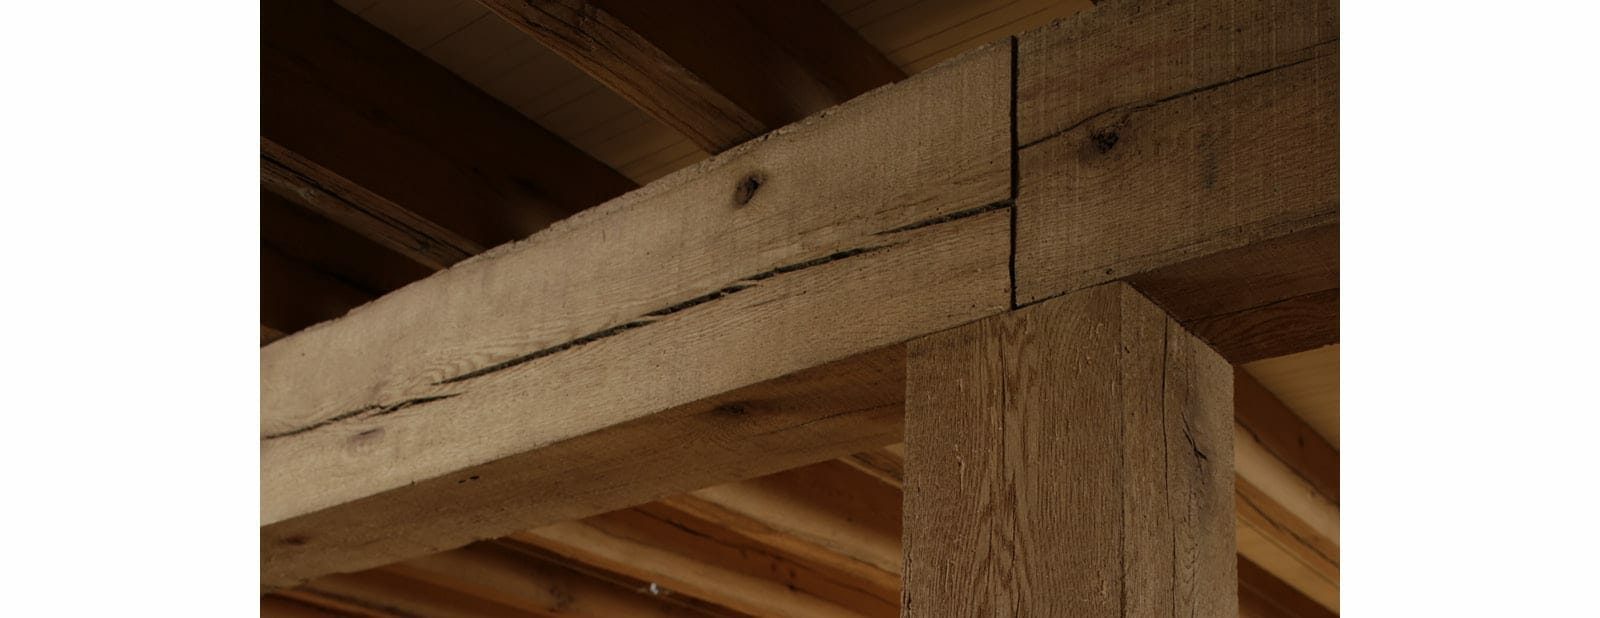 berwyn residence beam detail